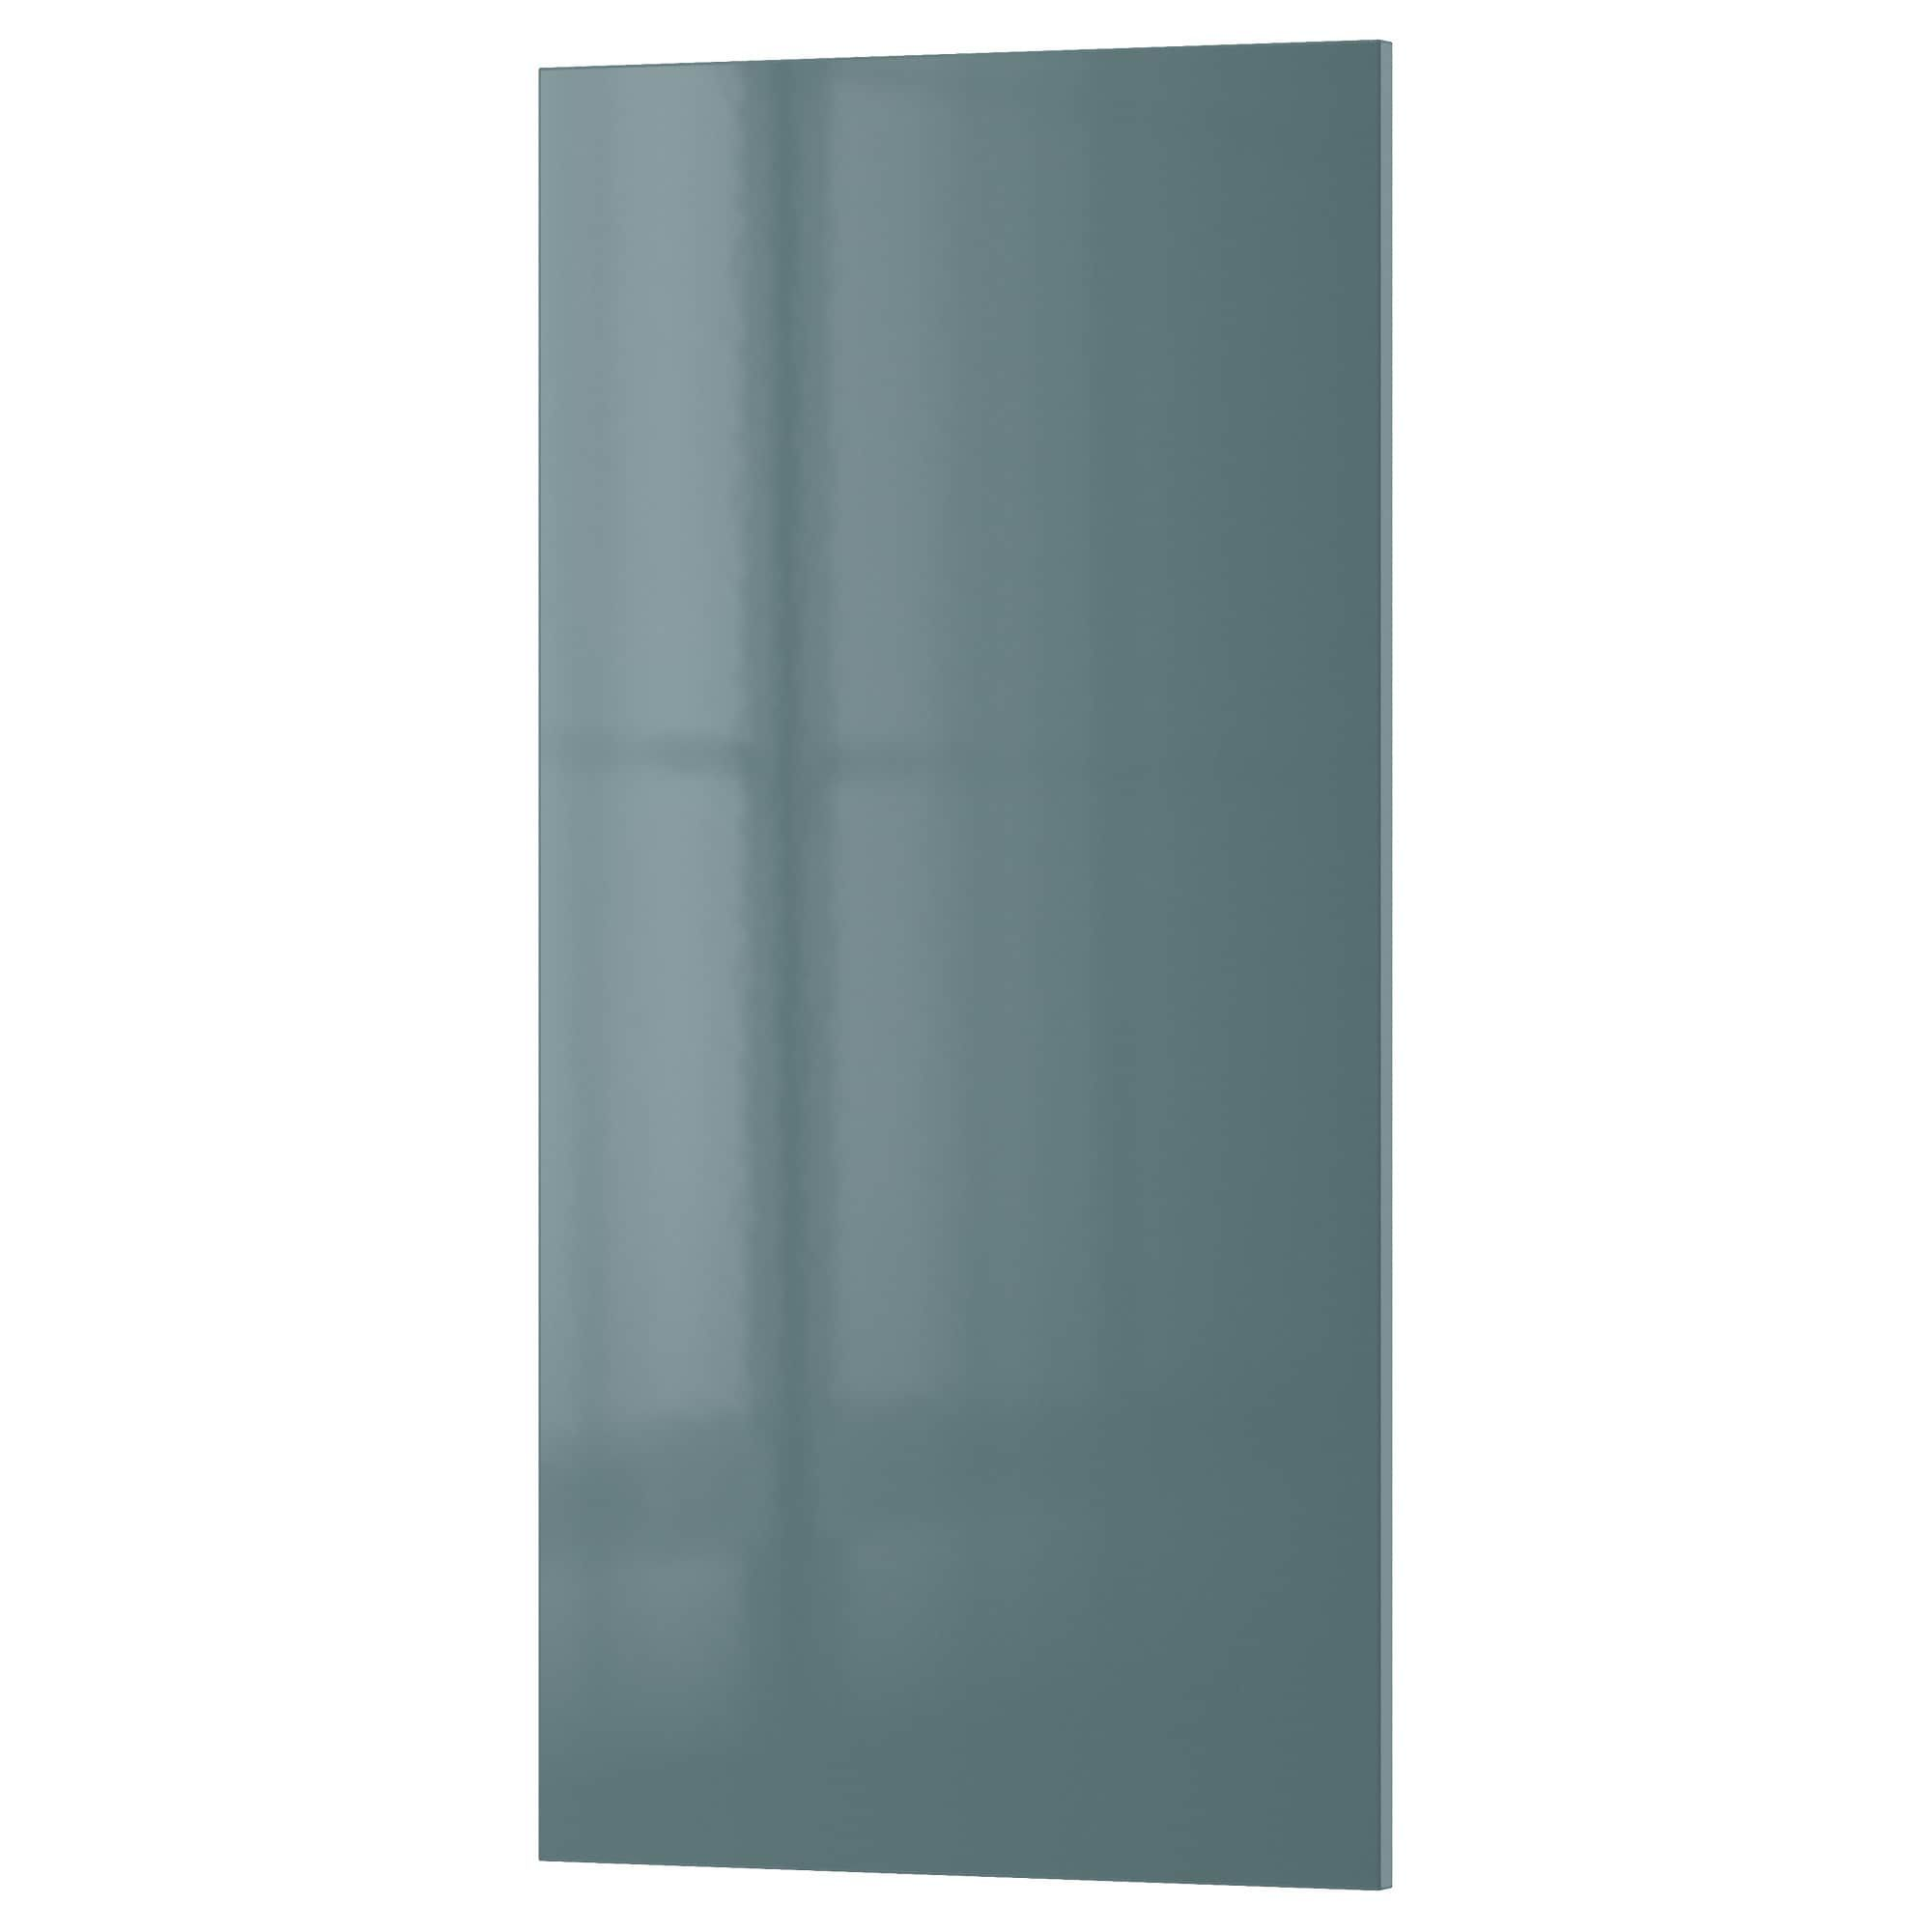 Best Kallarp Door High Gloss Gray Turquoise Ikea Tall 400 x 300